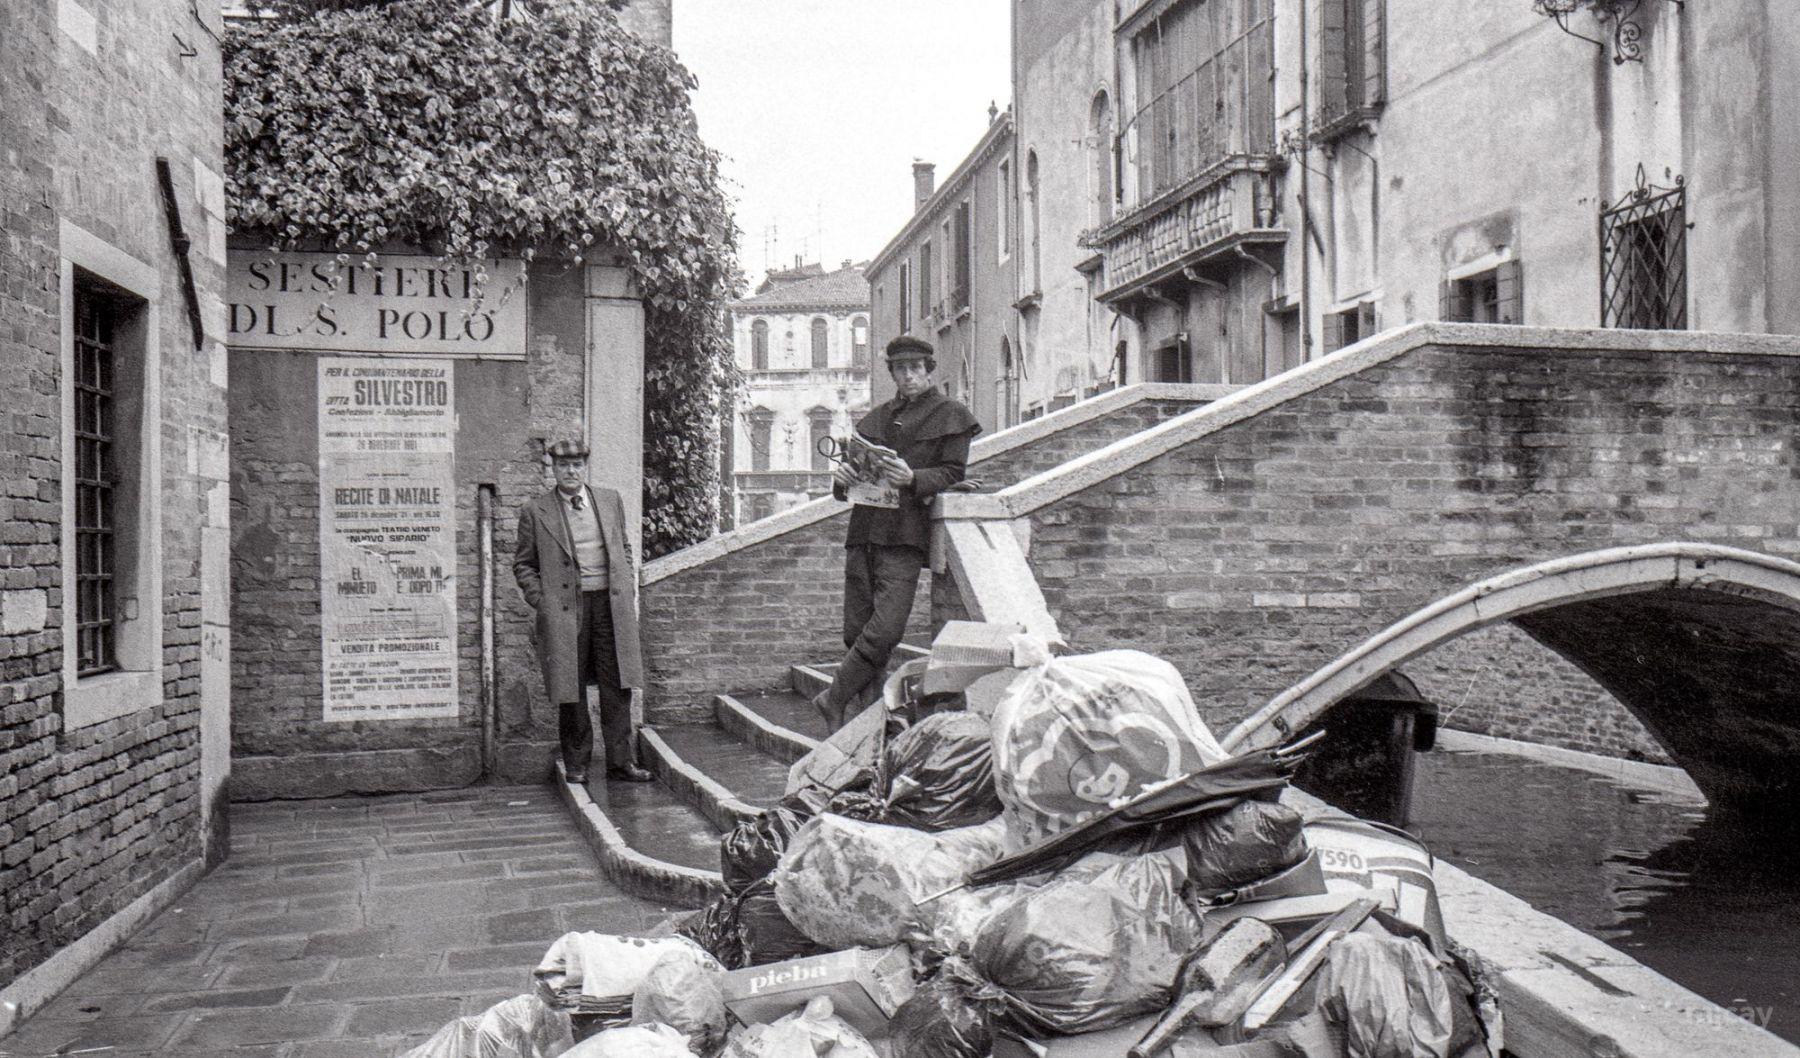 MichelAycaguer-Venise-AquaAlta-Noel-1981-19